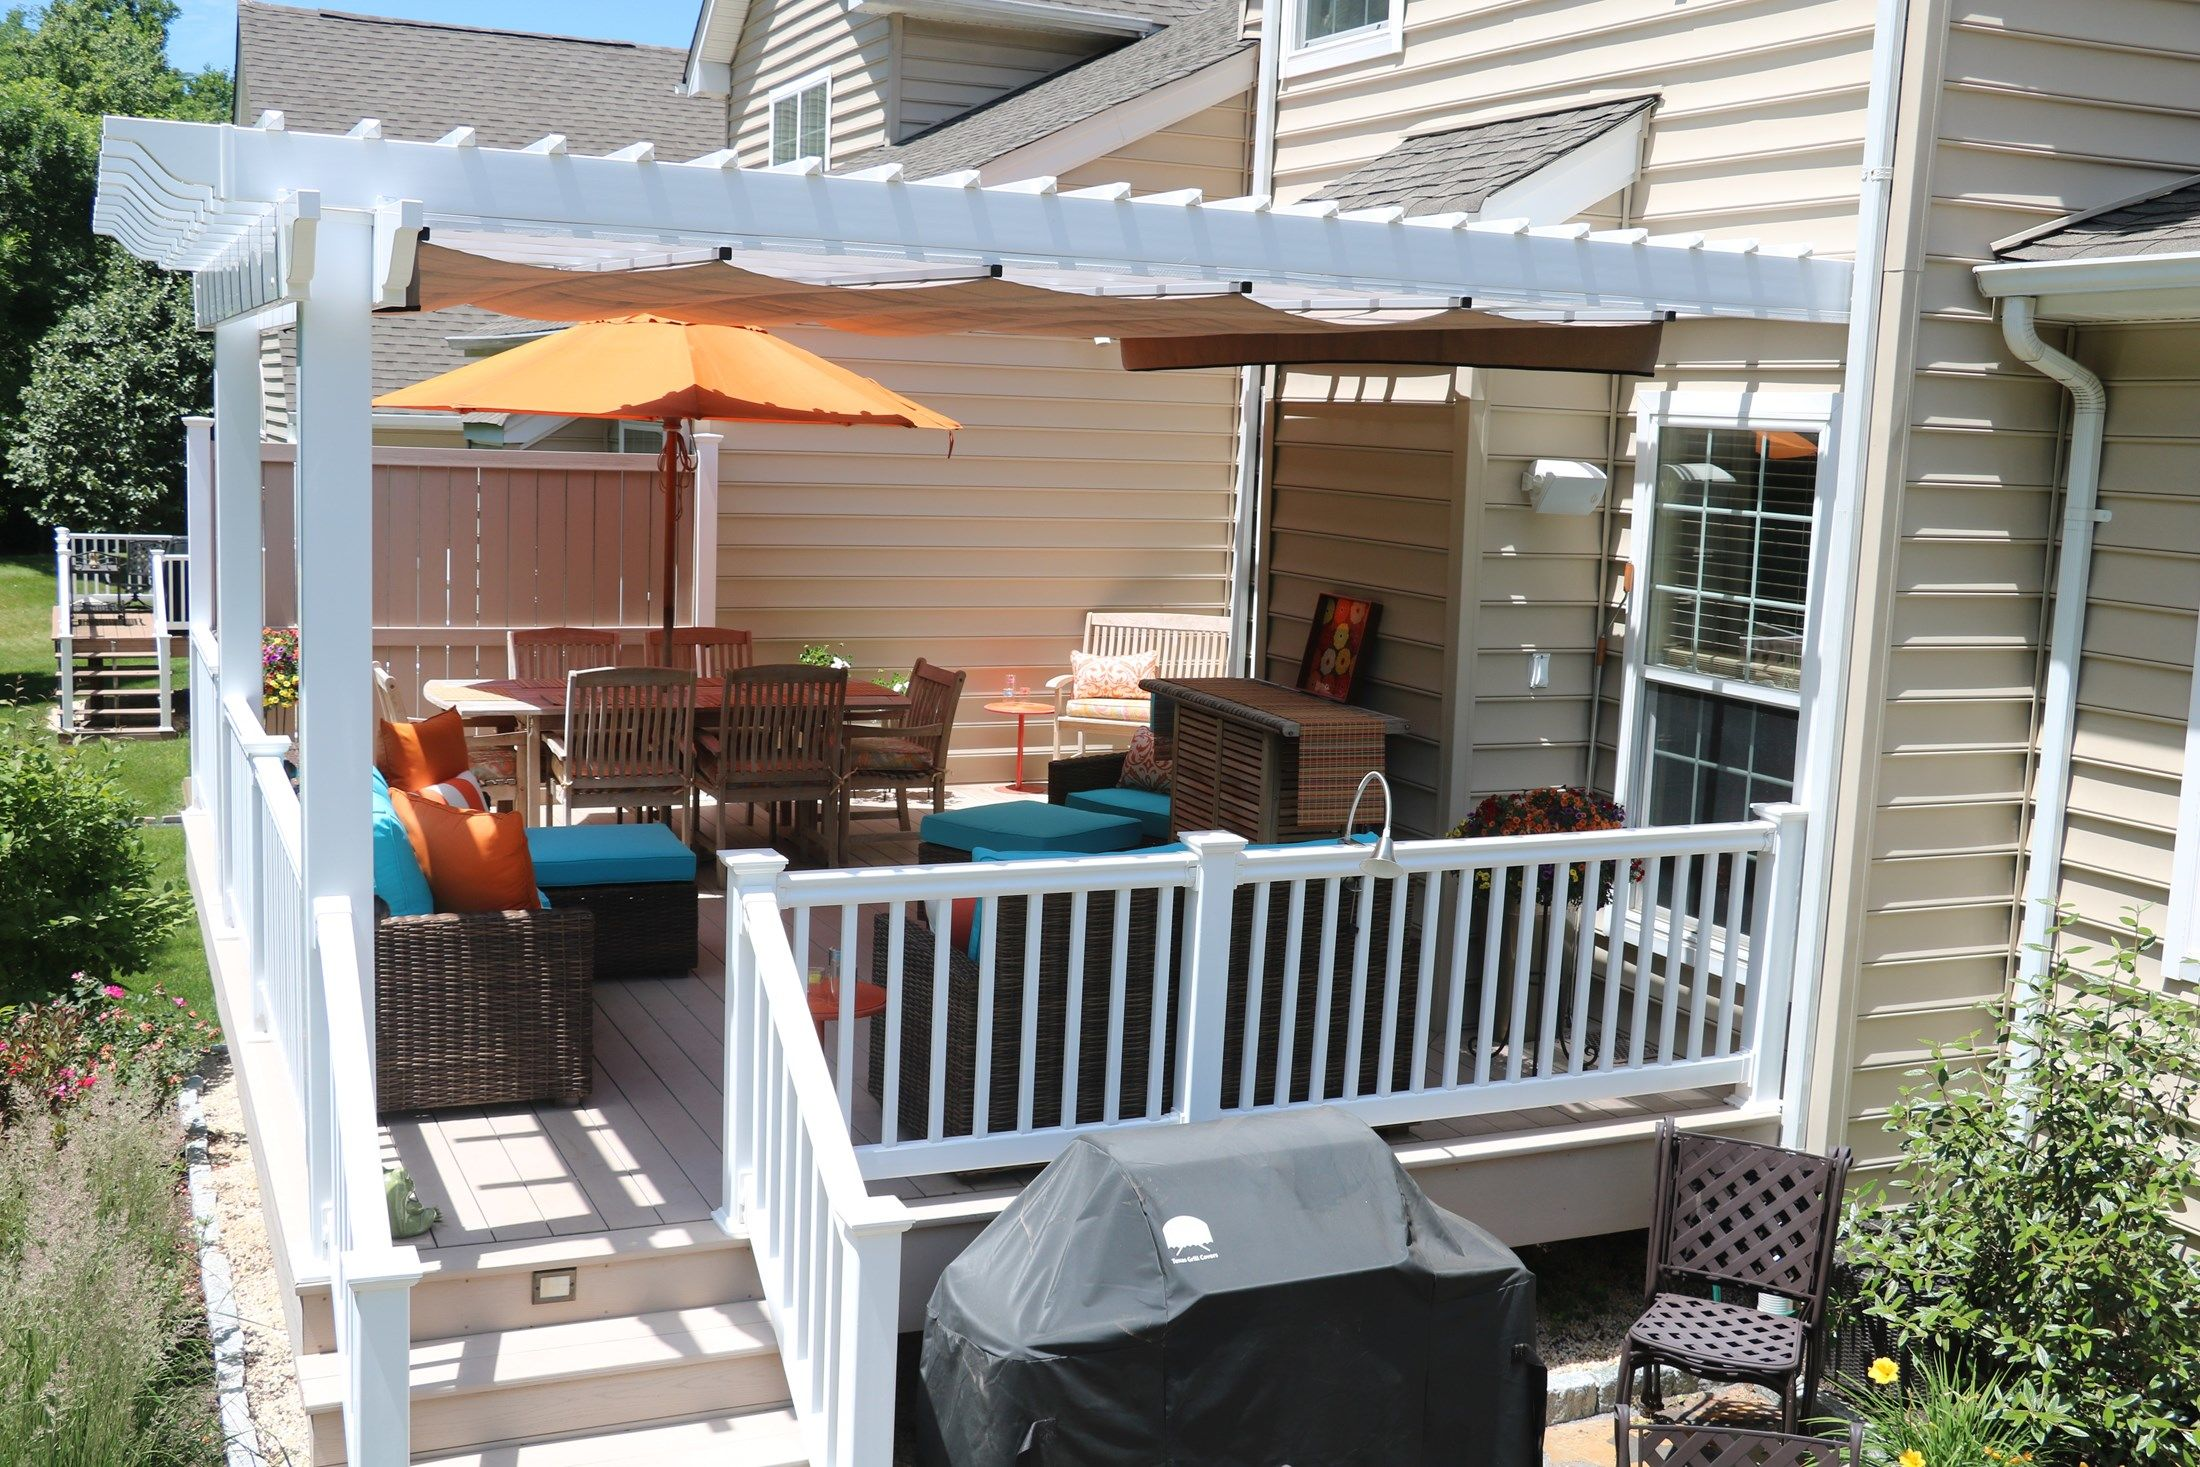 azek deck with vinyl pergola picture 6728. Black Bedroom Furniture Sets. Home Design Ideas